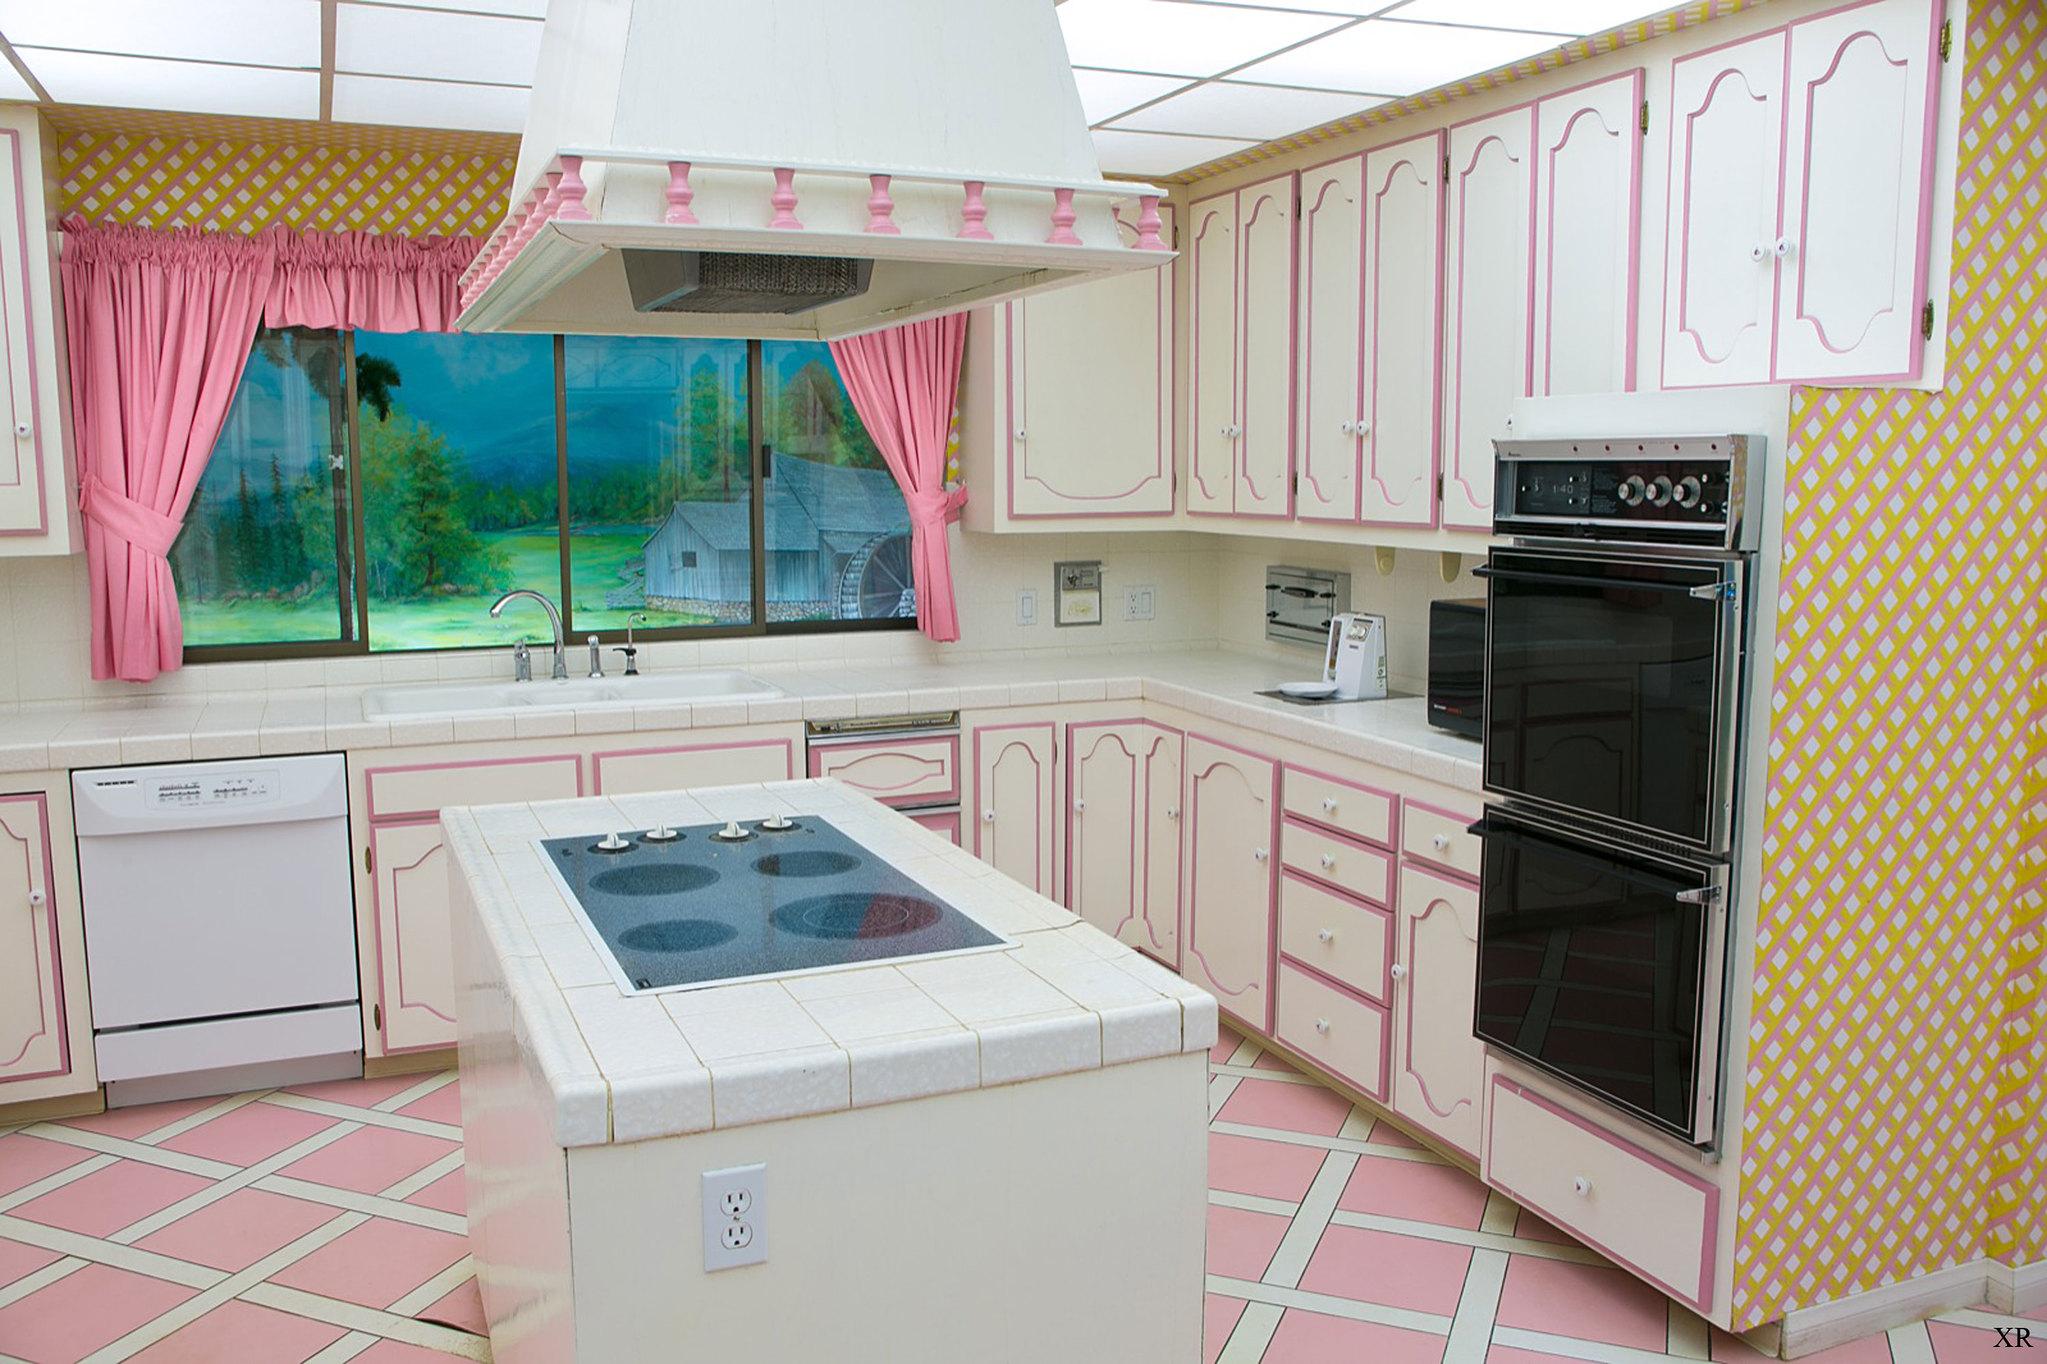 Delta Moen Or Kohler Kitchen Faucet